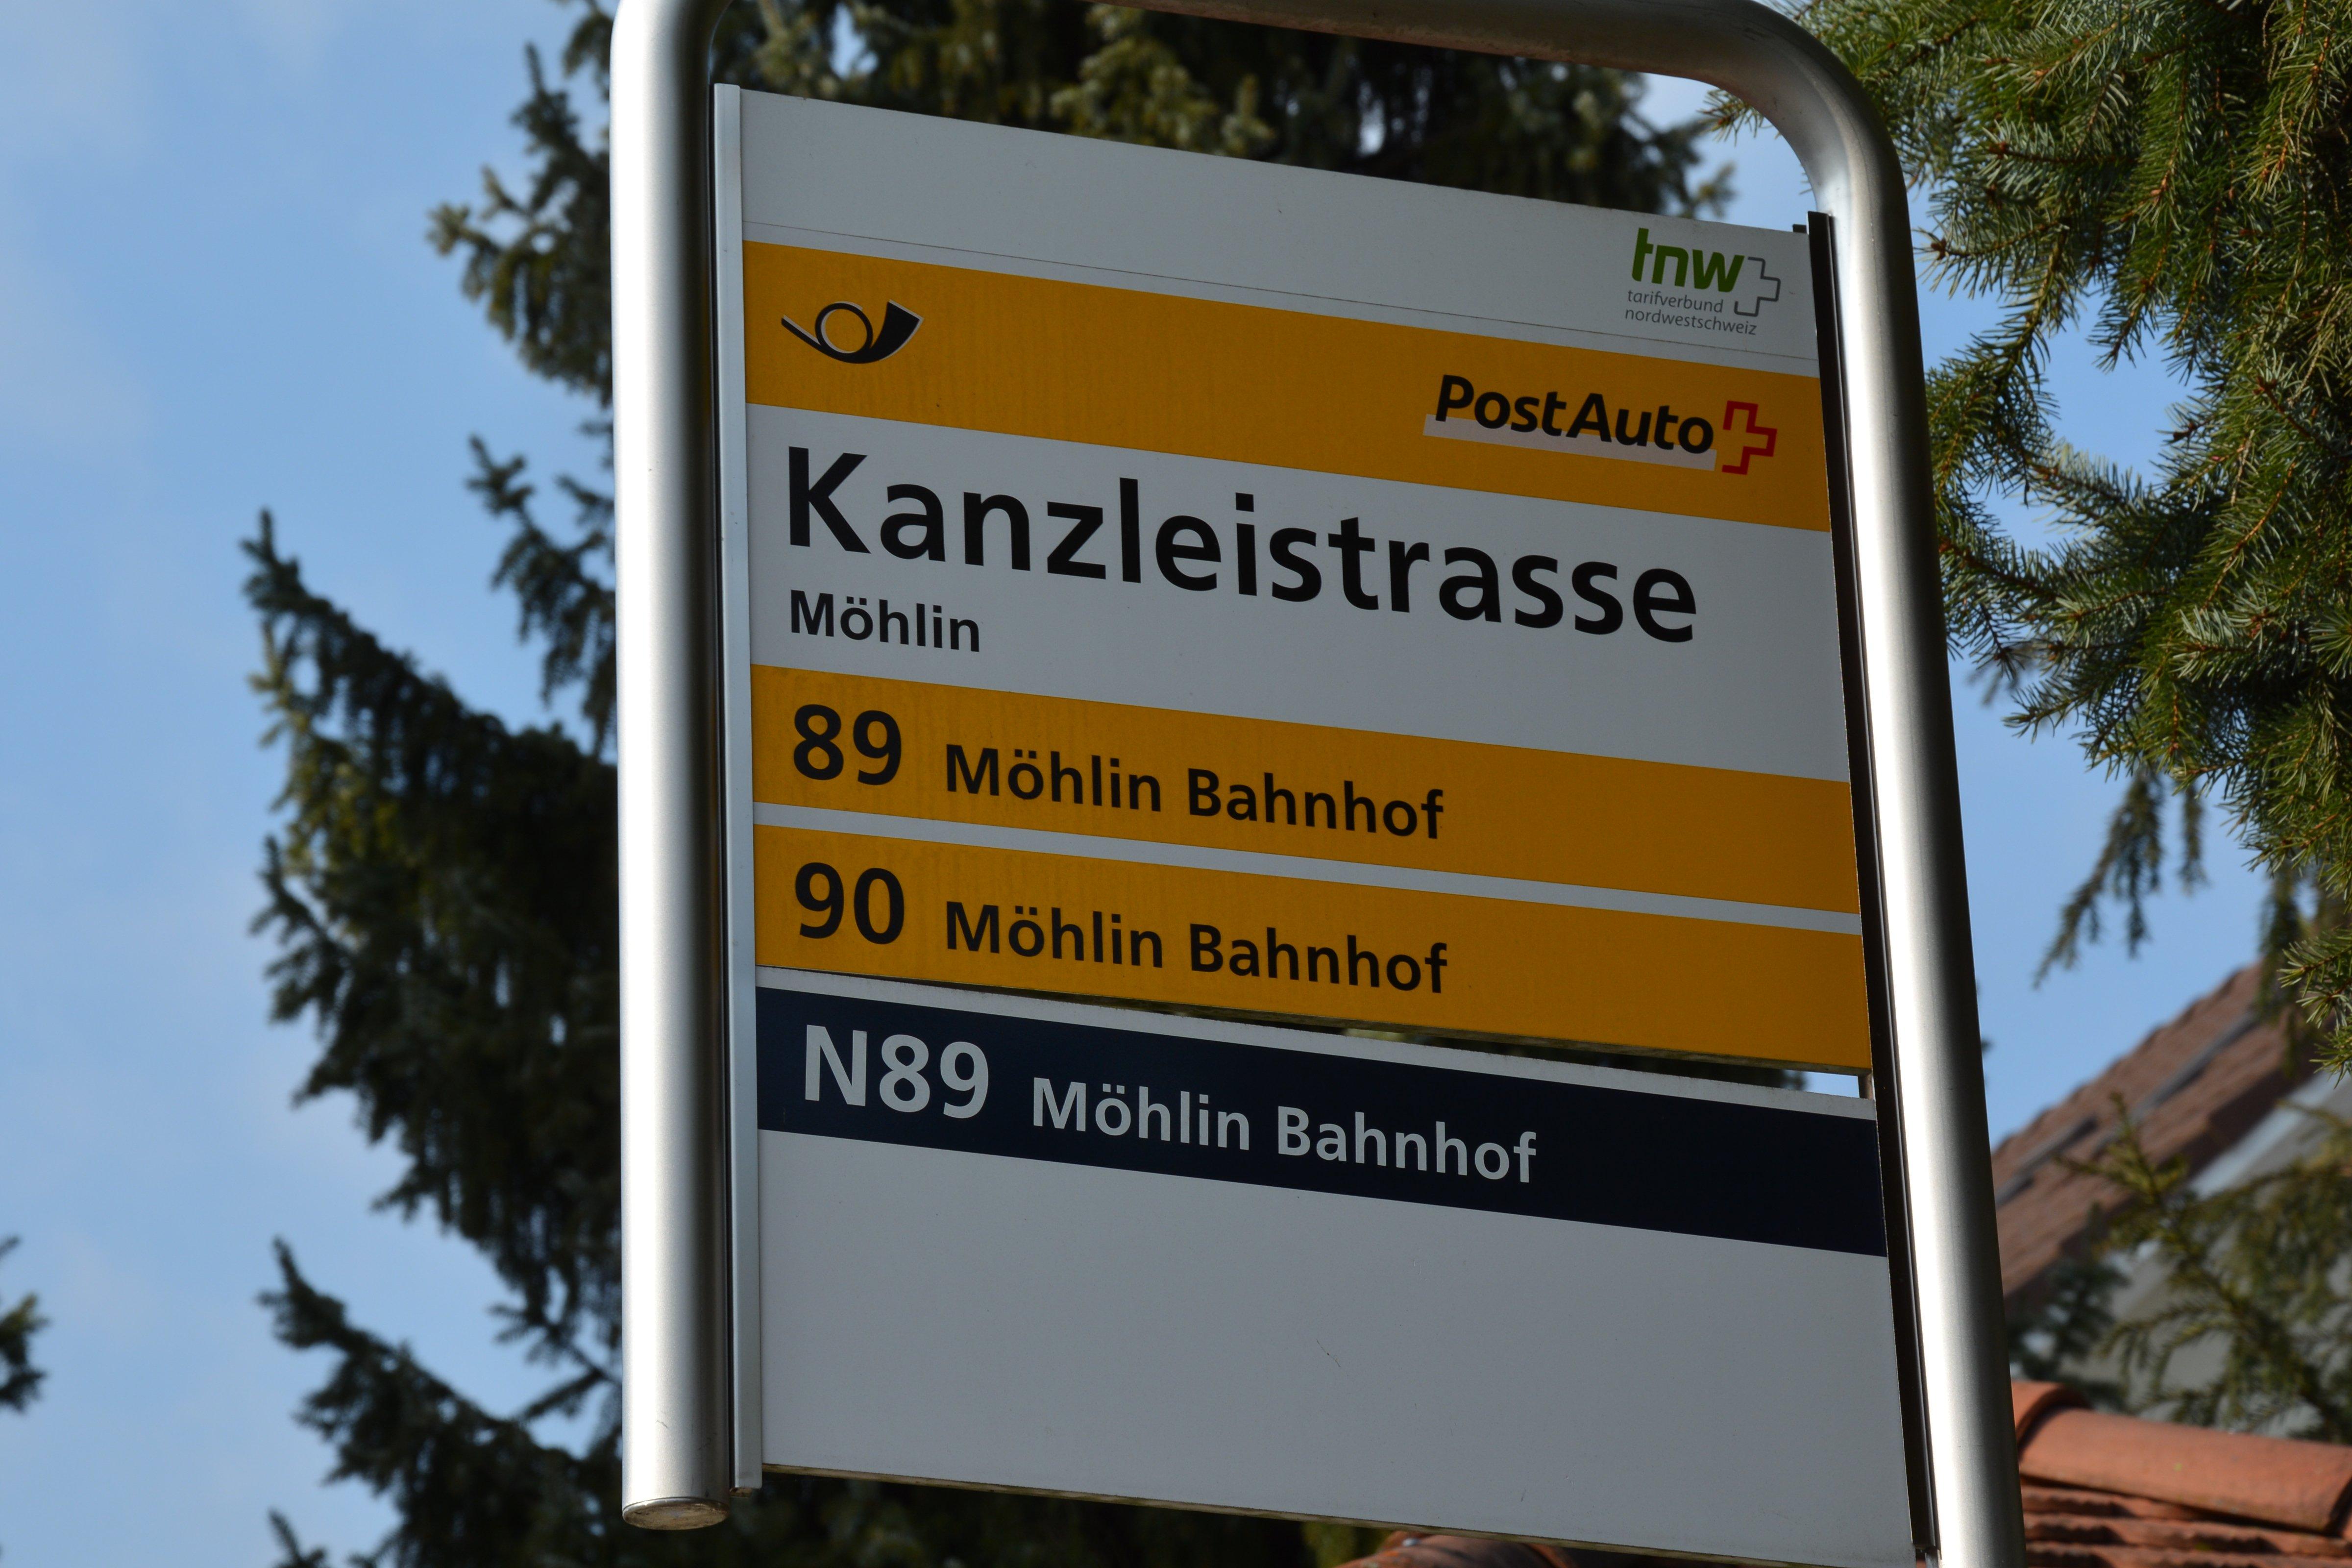 Postautohaltestelle Kanzleistrasse Möhlin